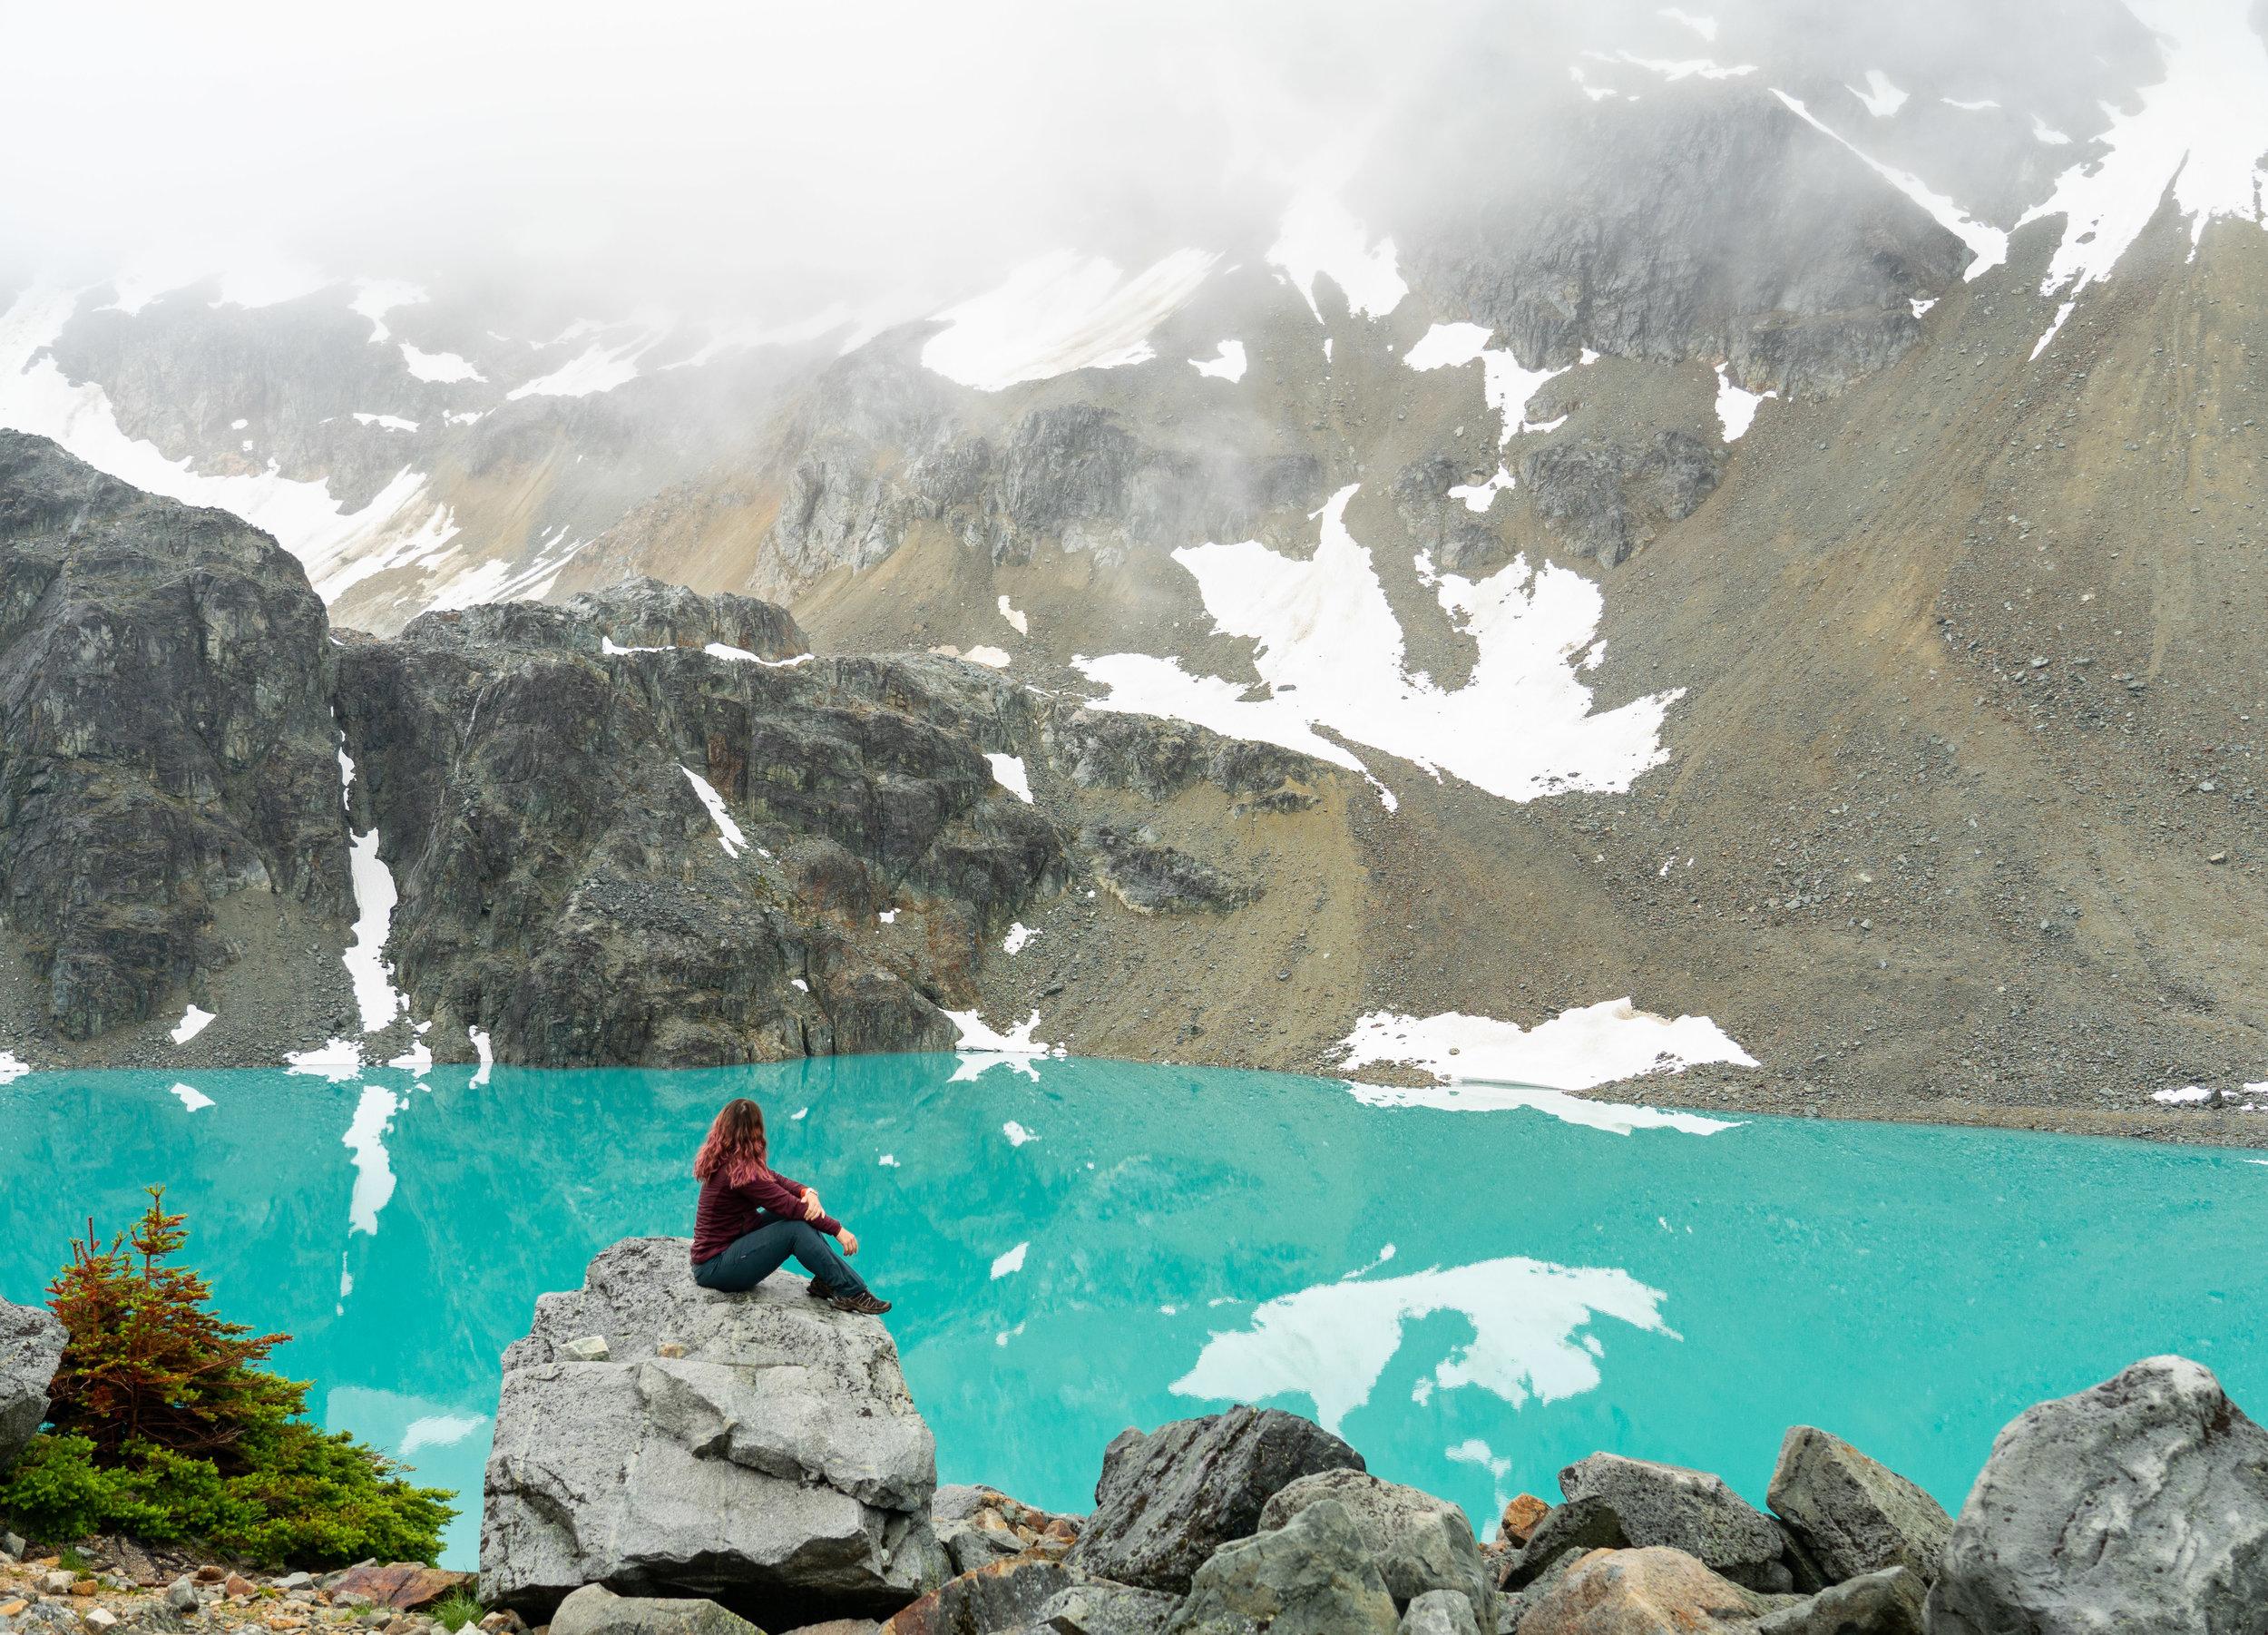 Backpacking-wedgemount-lake-in-garibaldi-provincial-park-1.jpg